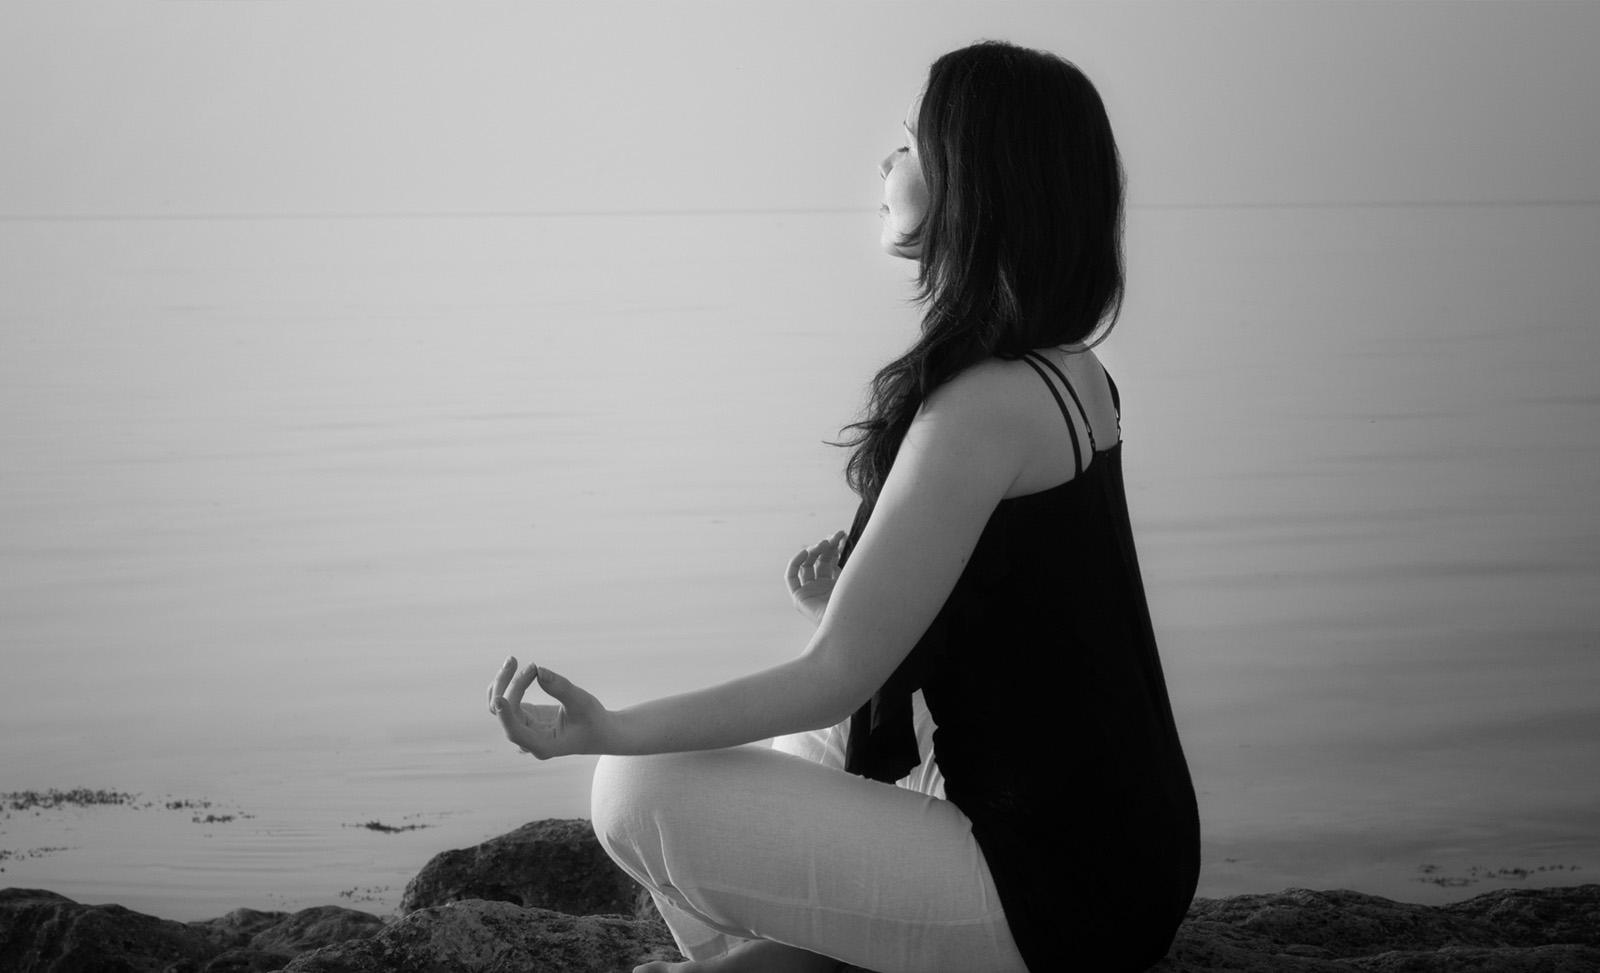 Woman sat in meditation pose